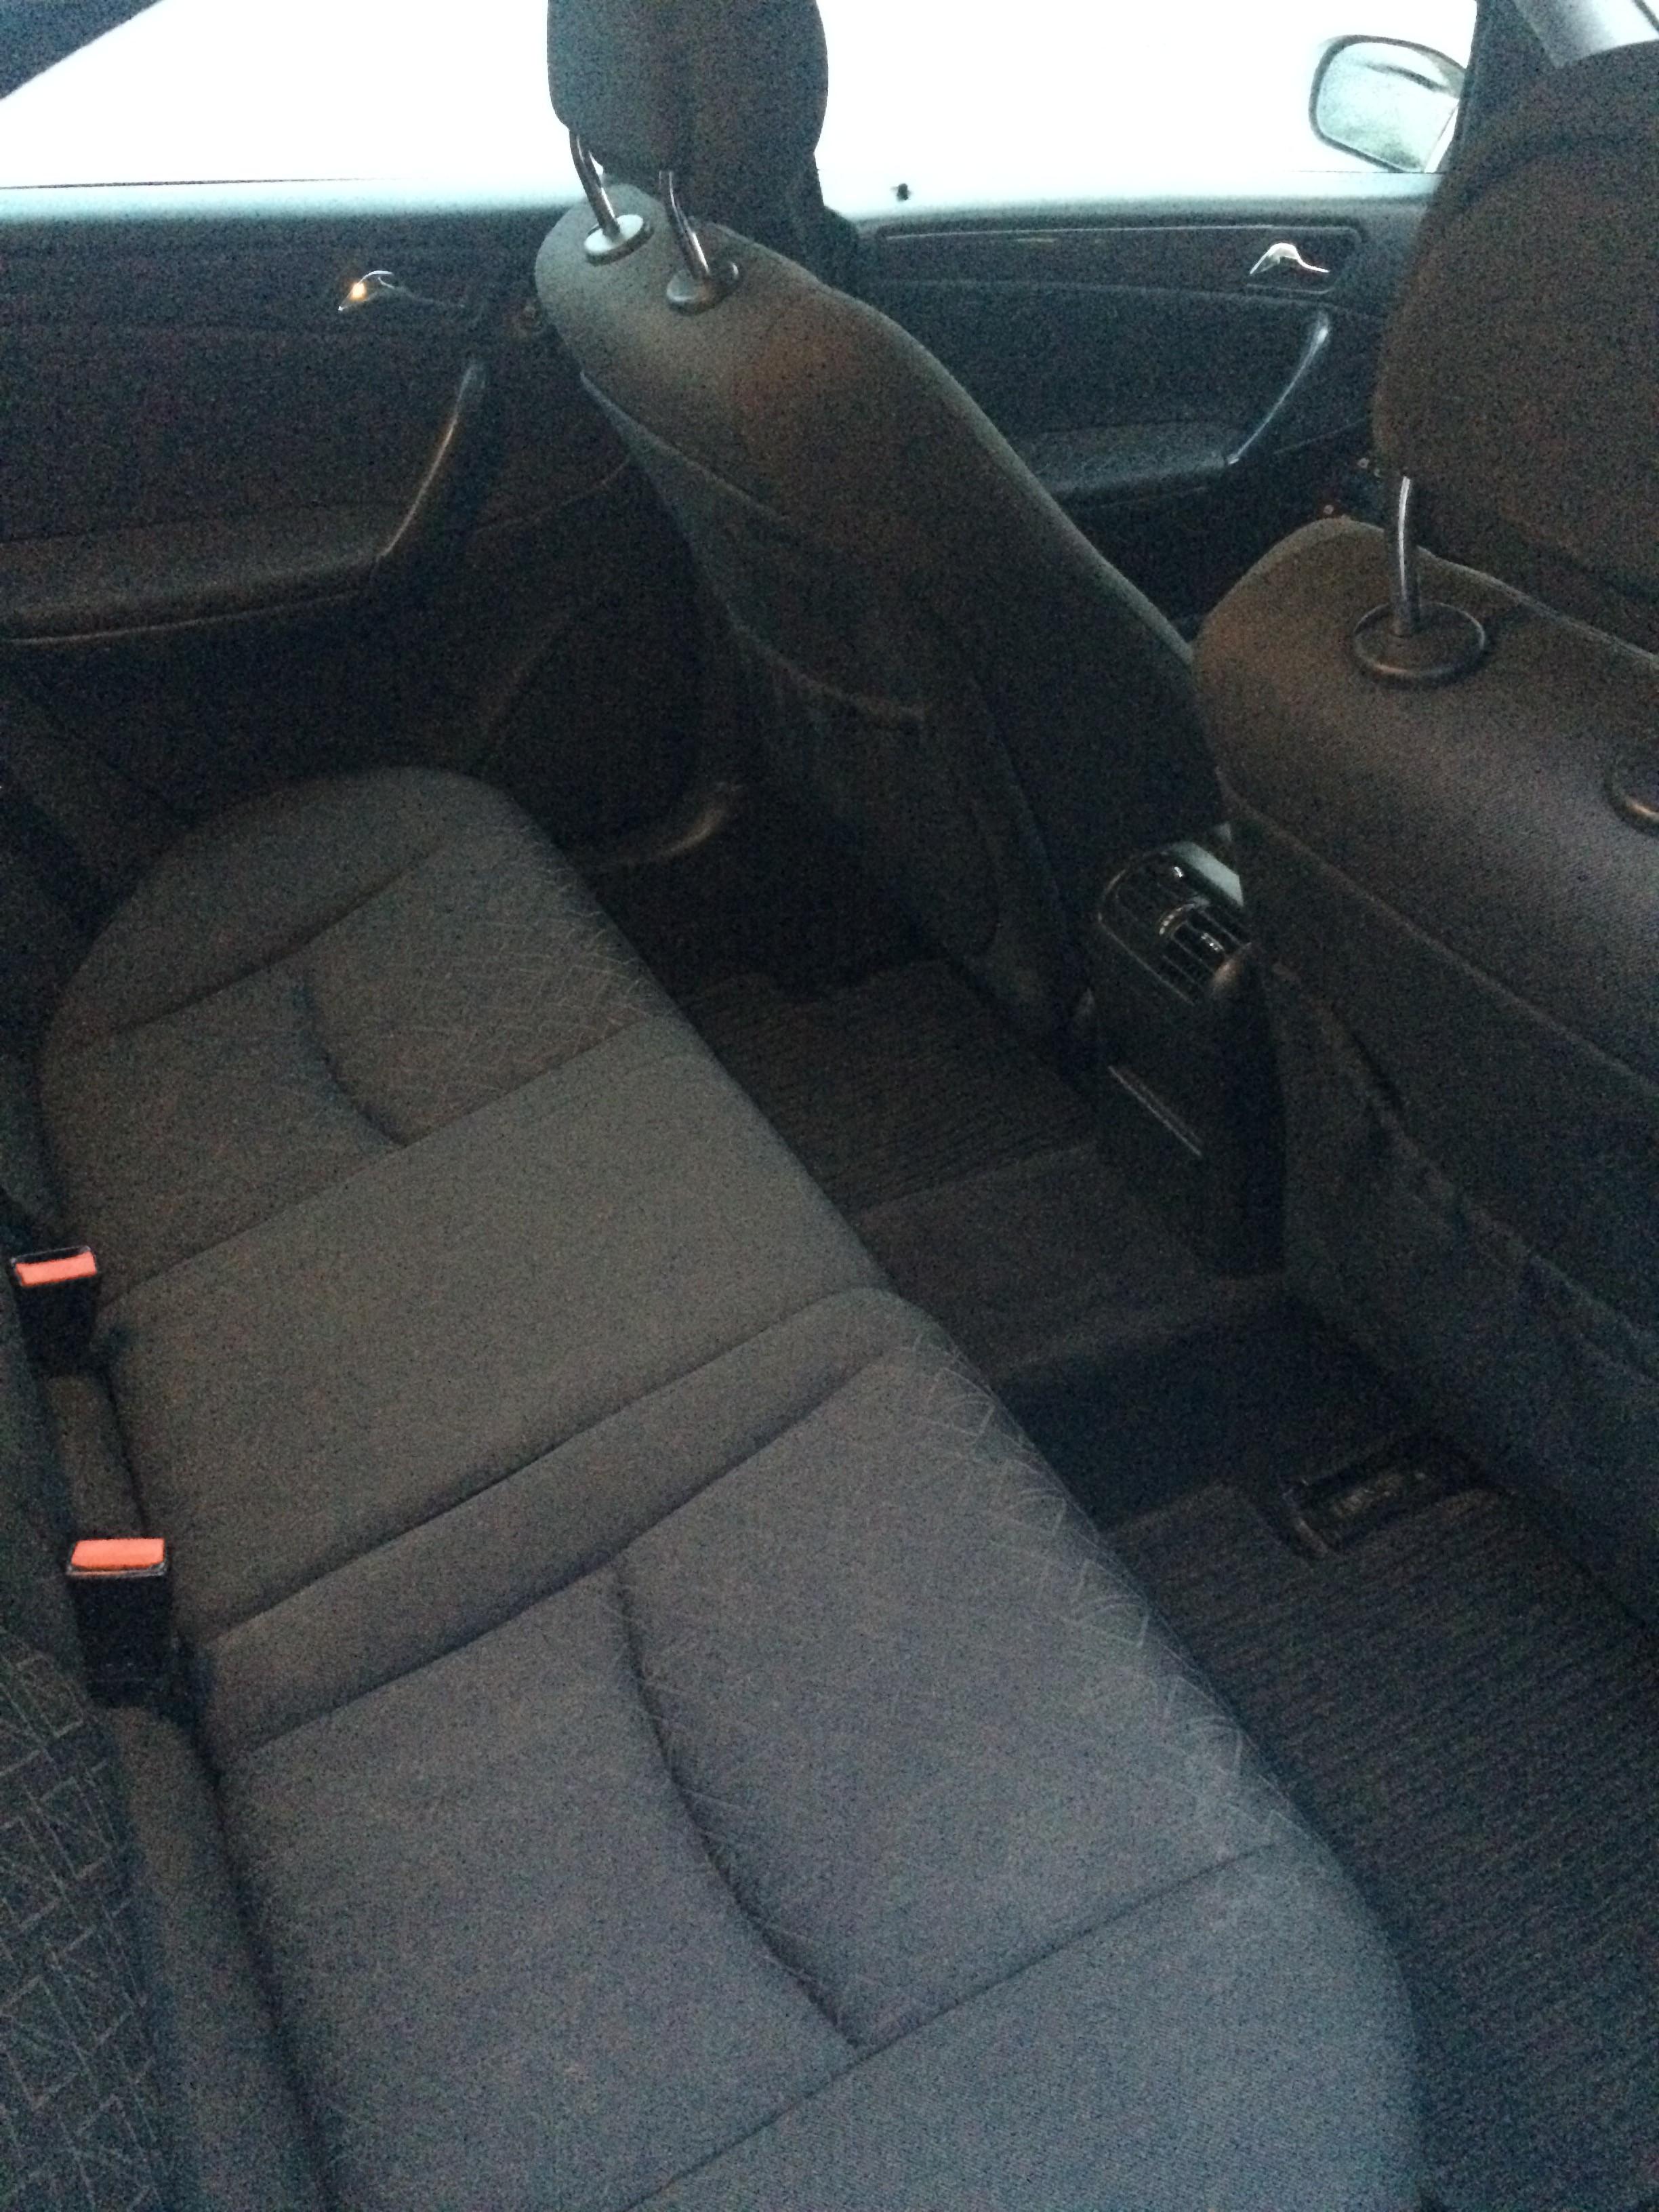 Mercedes-Benz C 200 2.0(lt) 2001 Second hand  $11900